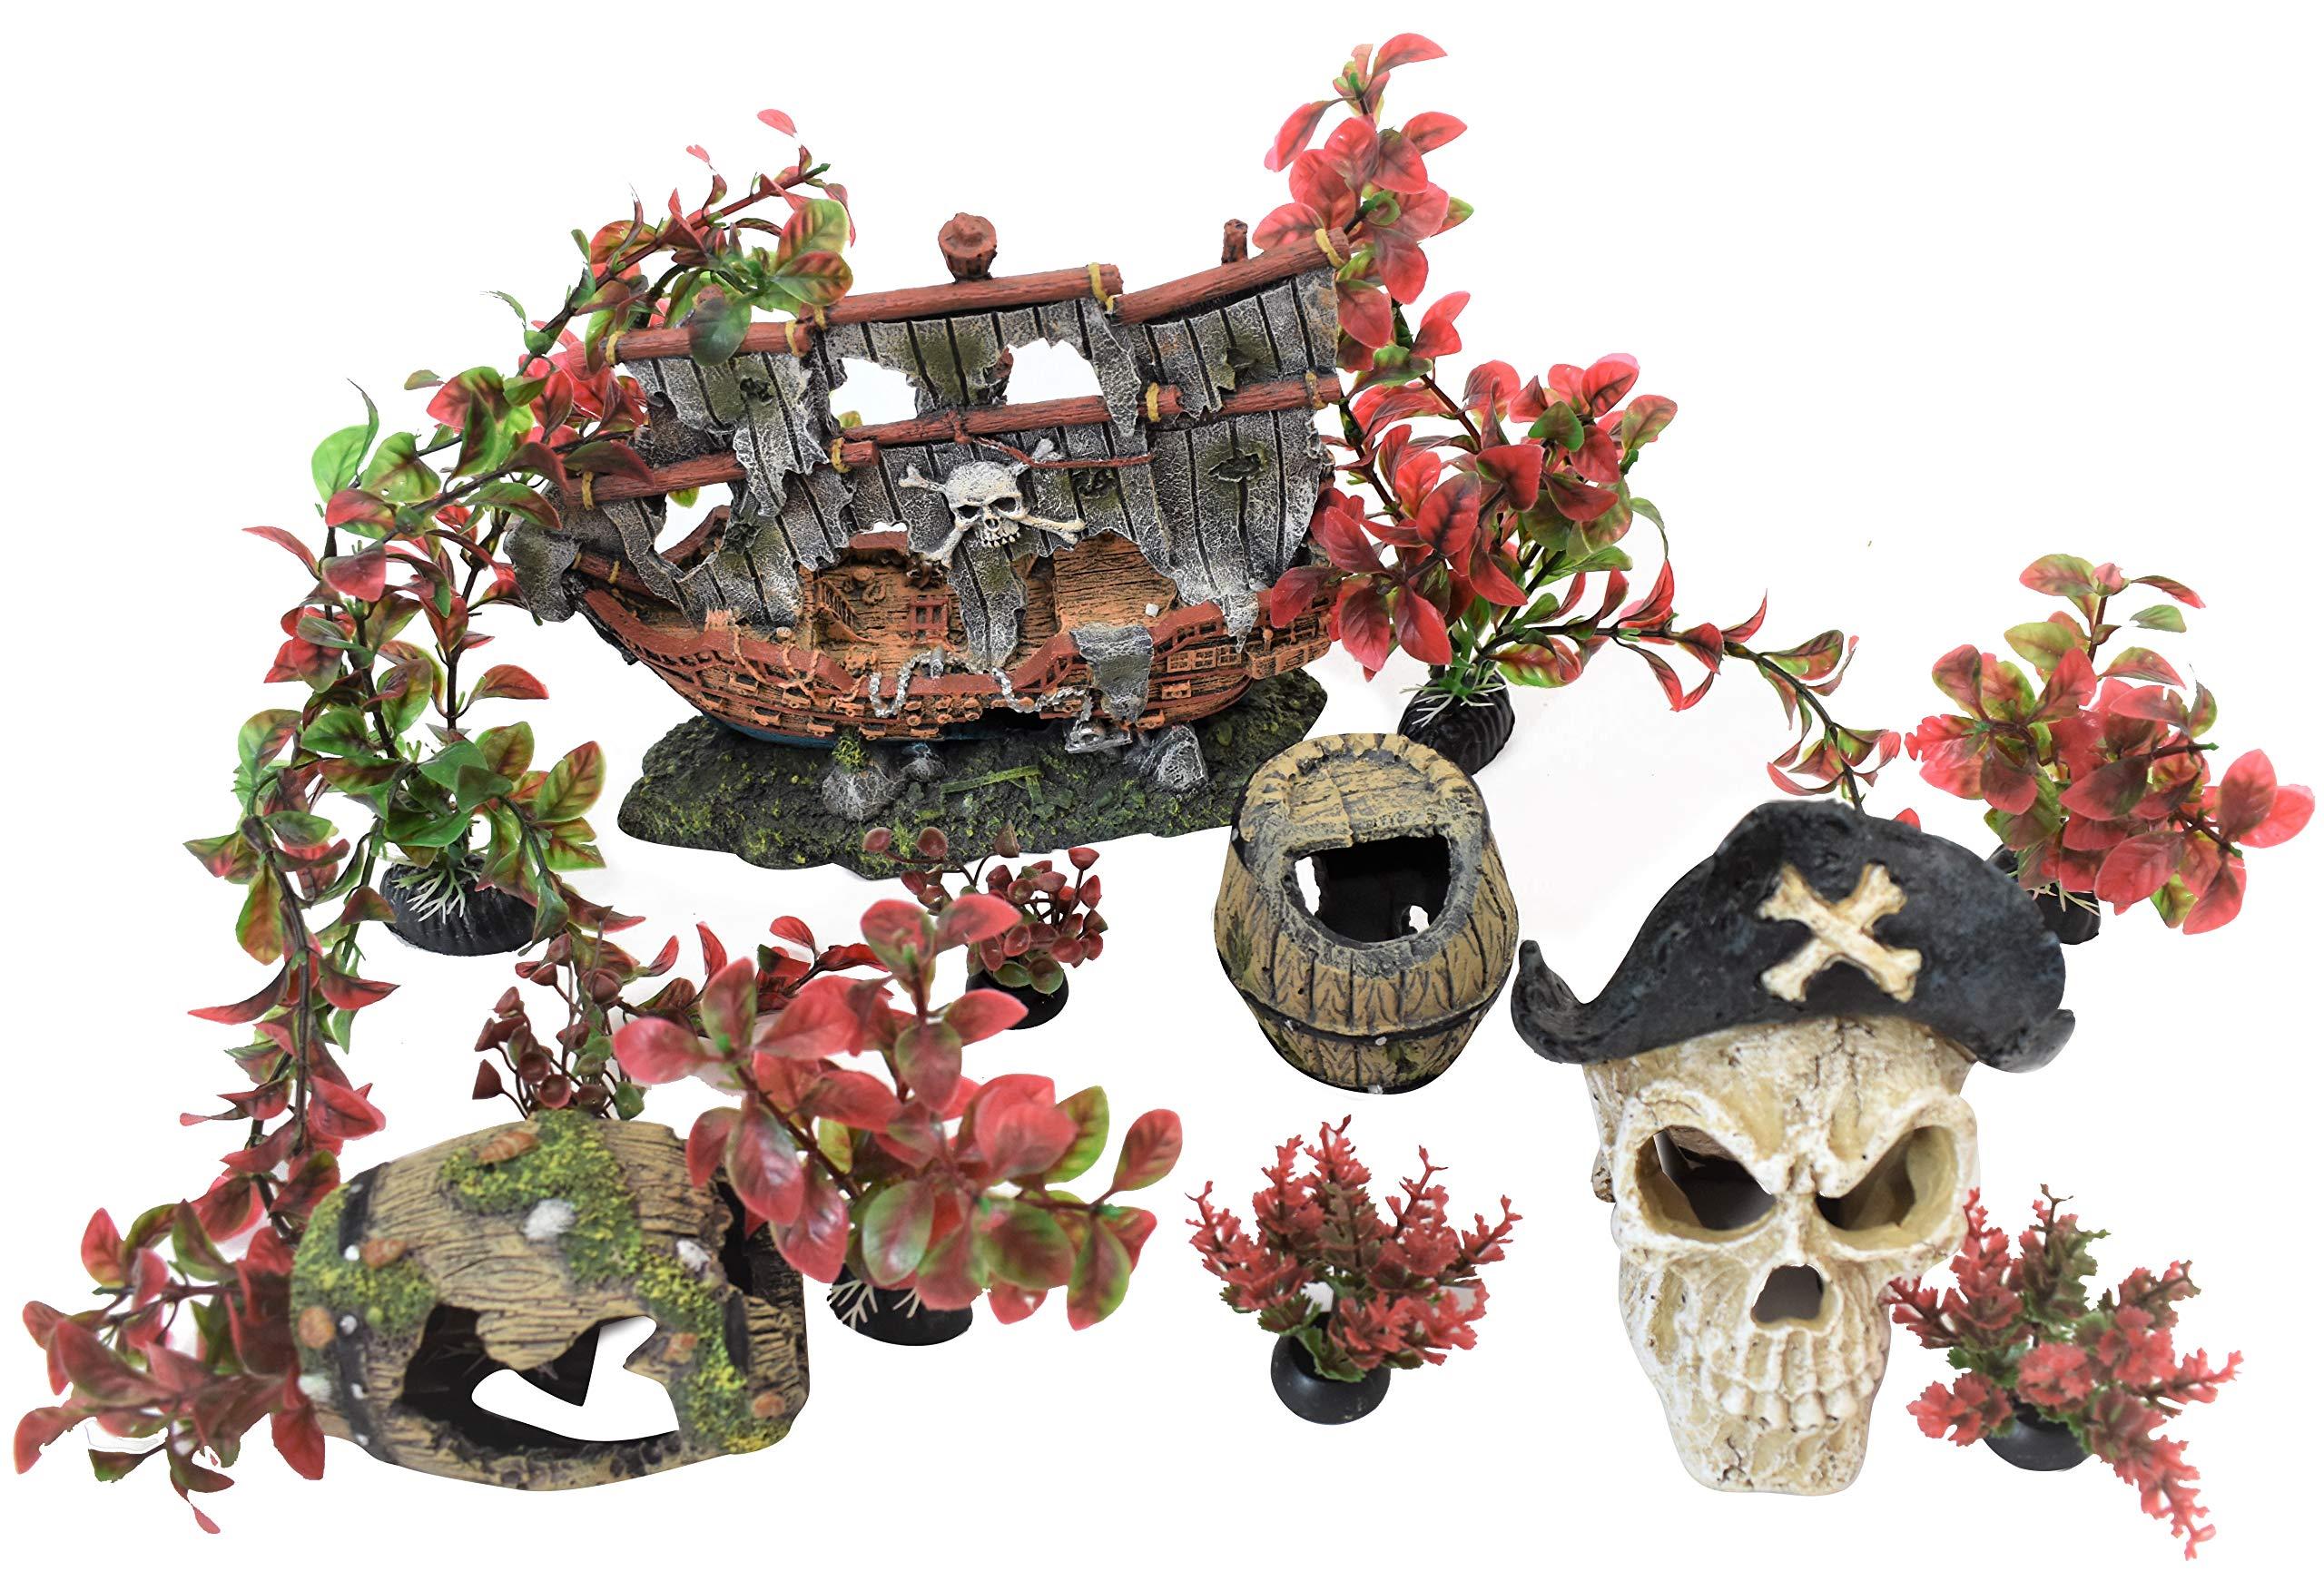 ByTheBay Aquarium Pirate Decoration Ornaments for Fish Tanks (Pirate Ship) by ByTheBay Aquatics